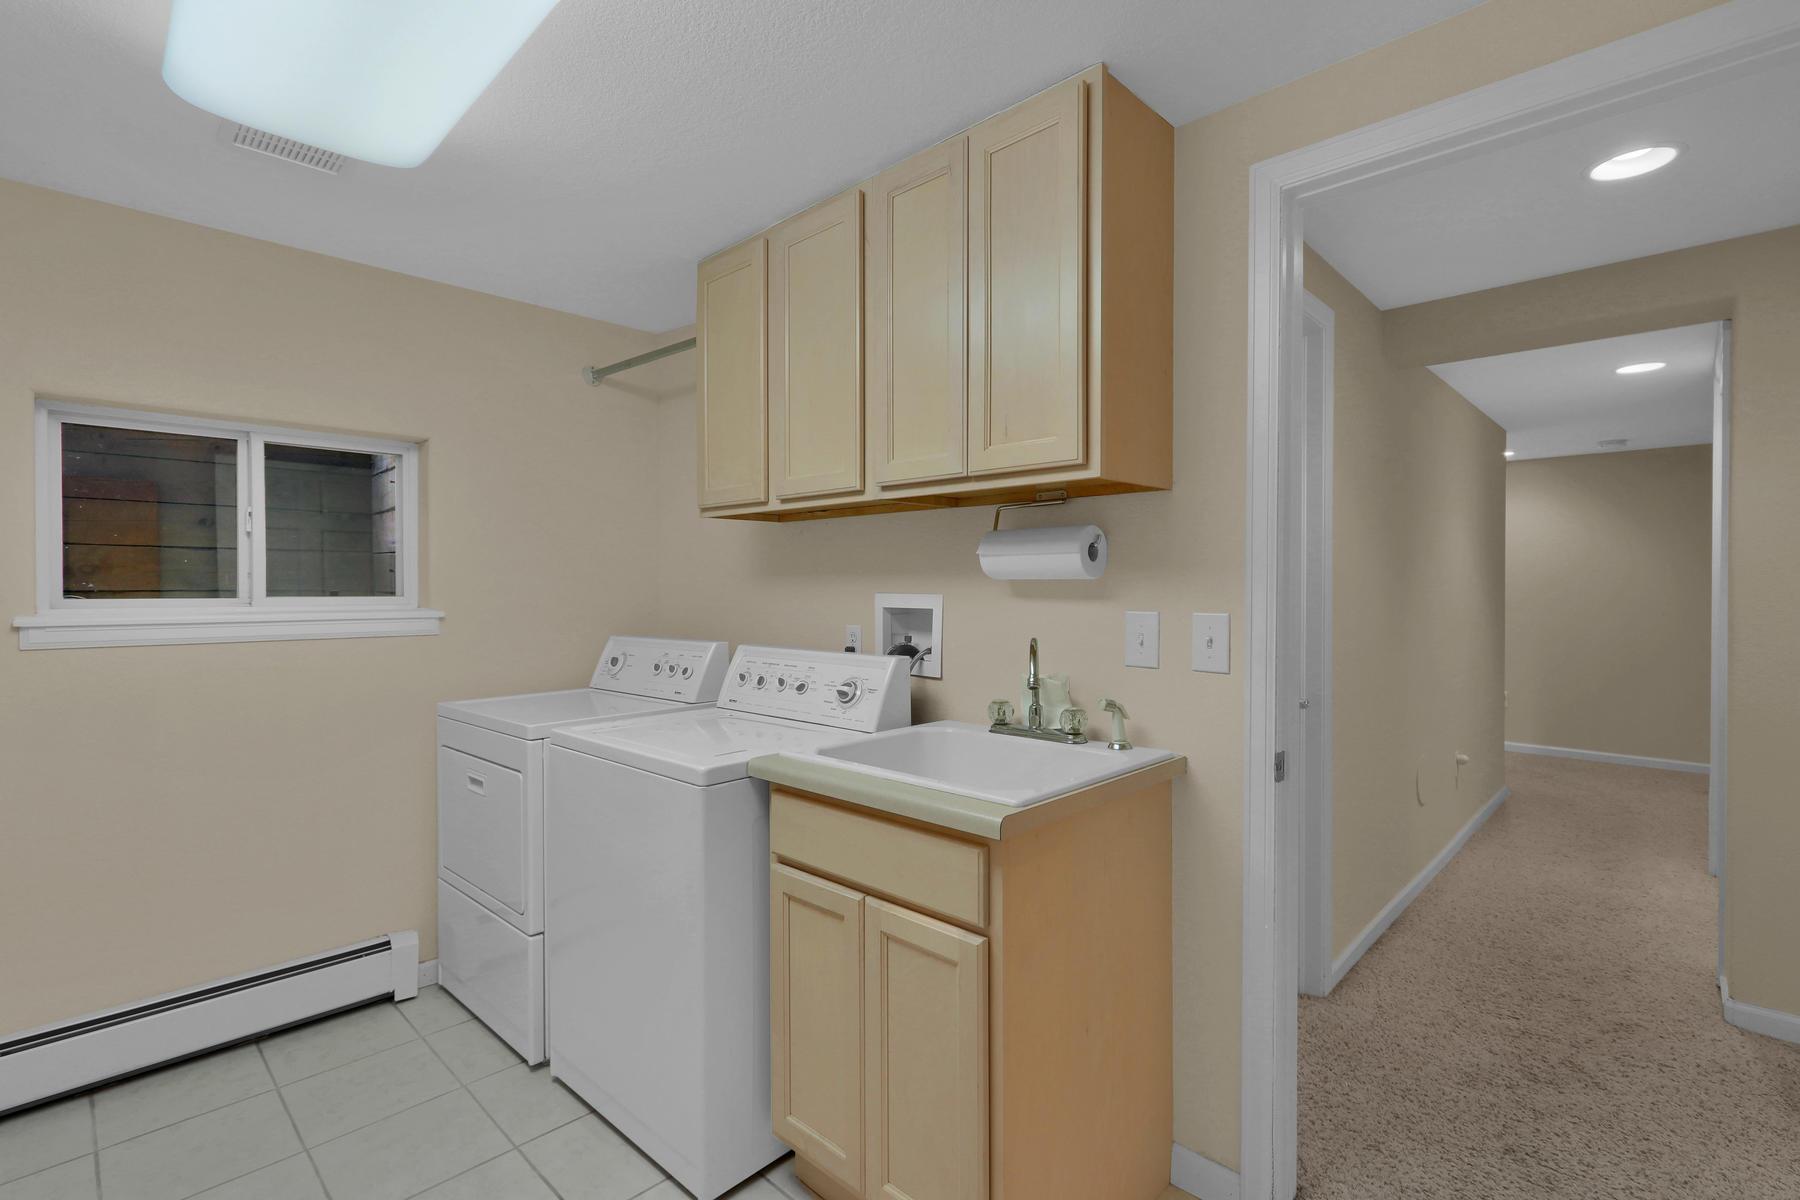 3845 Everett St Wheat Ridge CO-039-14-Laundry-MLS_Size.jpg